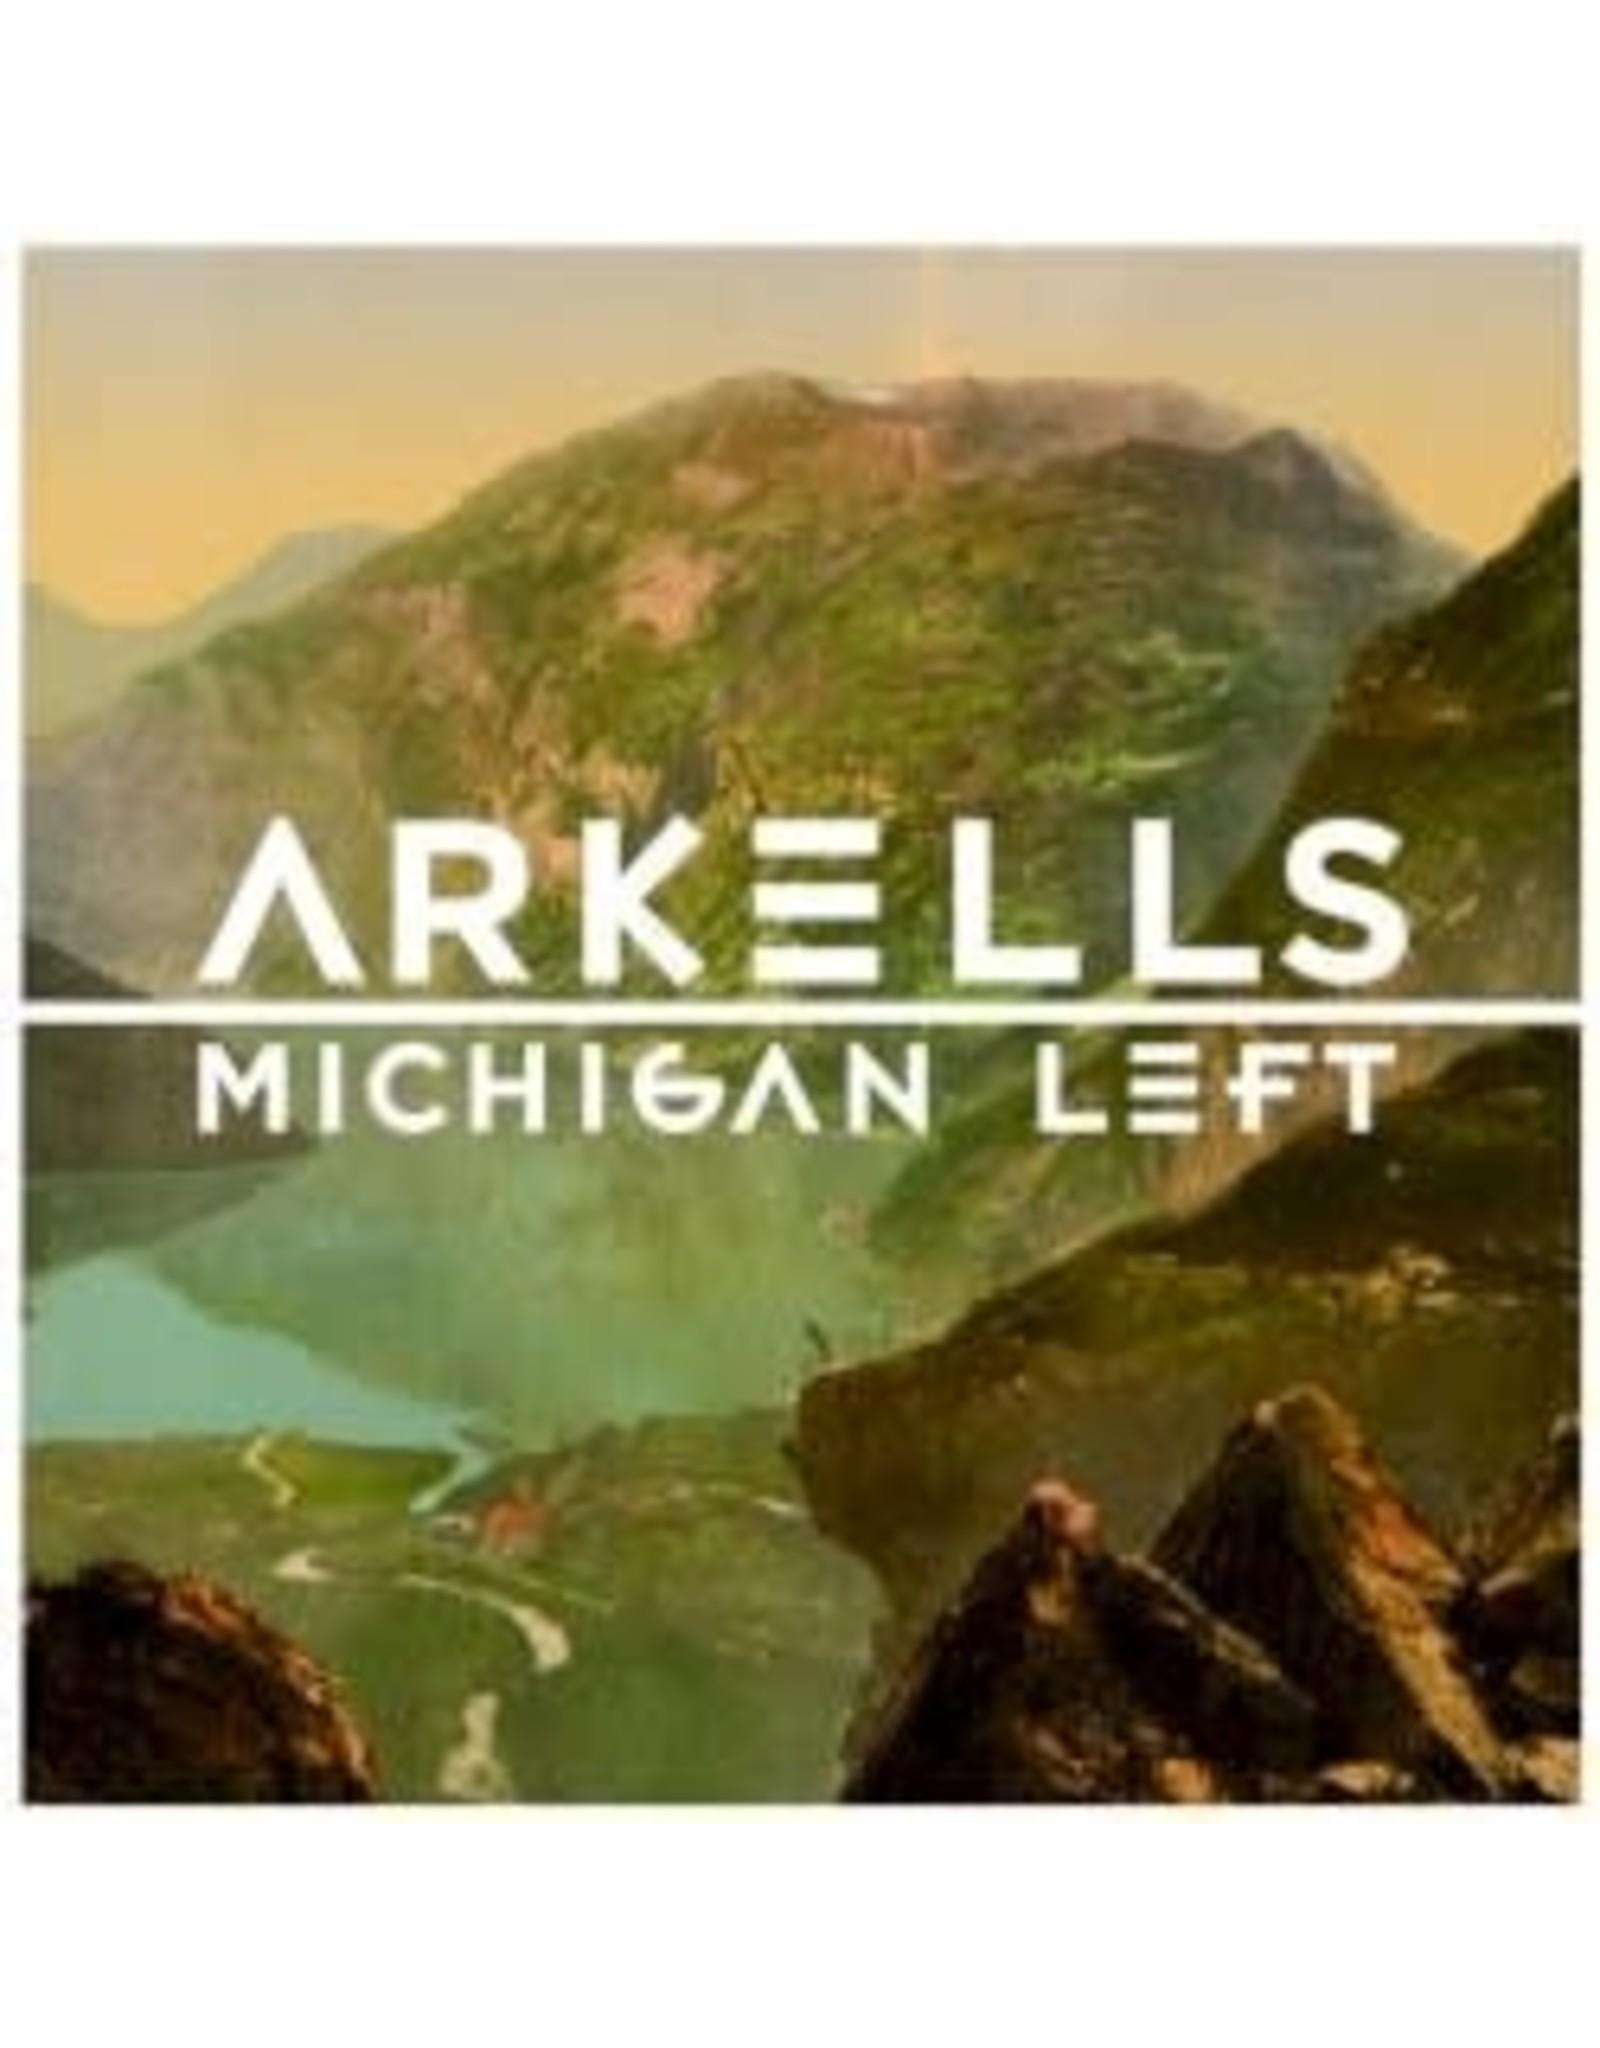 Arkells - Michigan Left LP